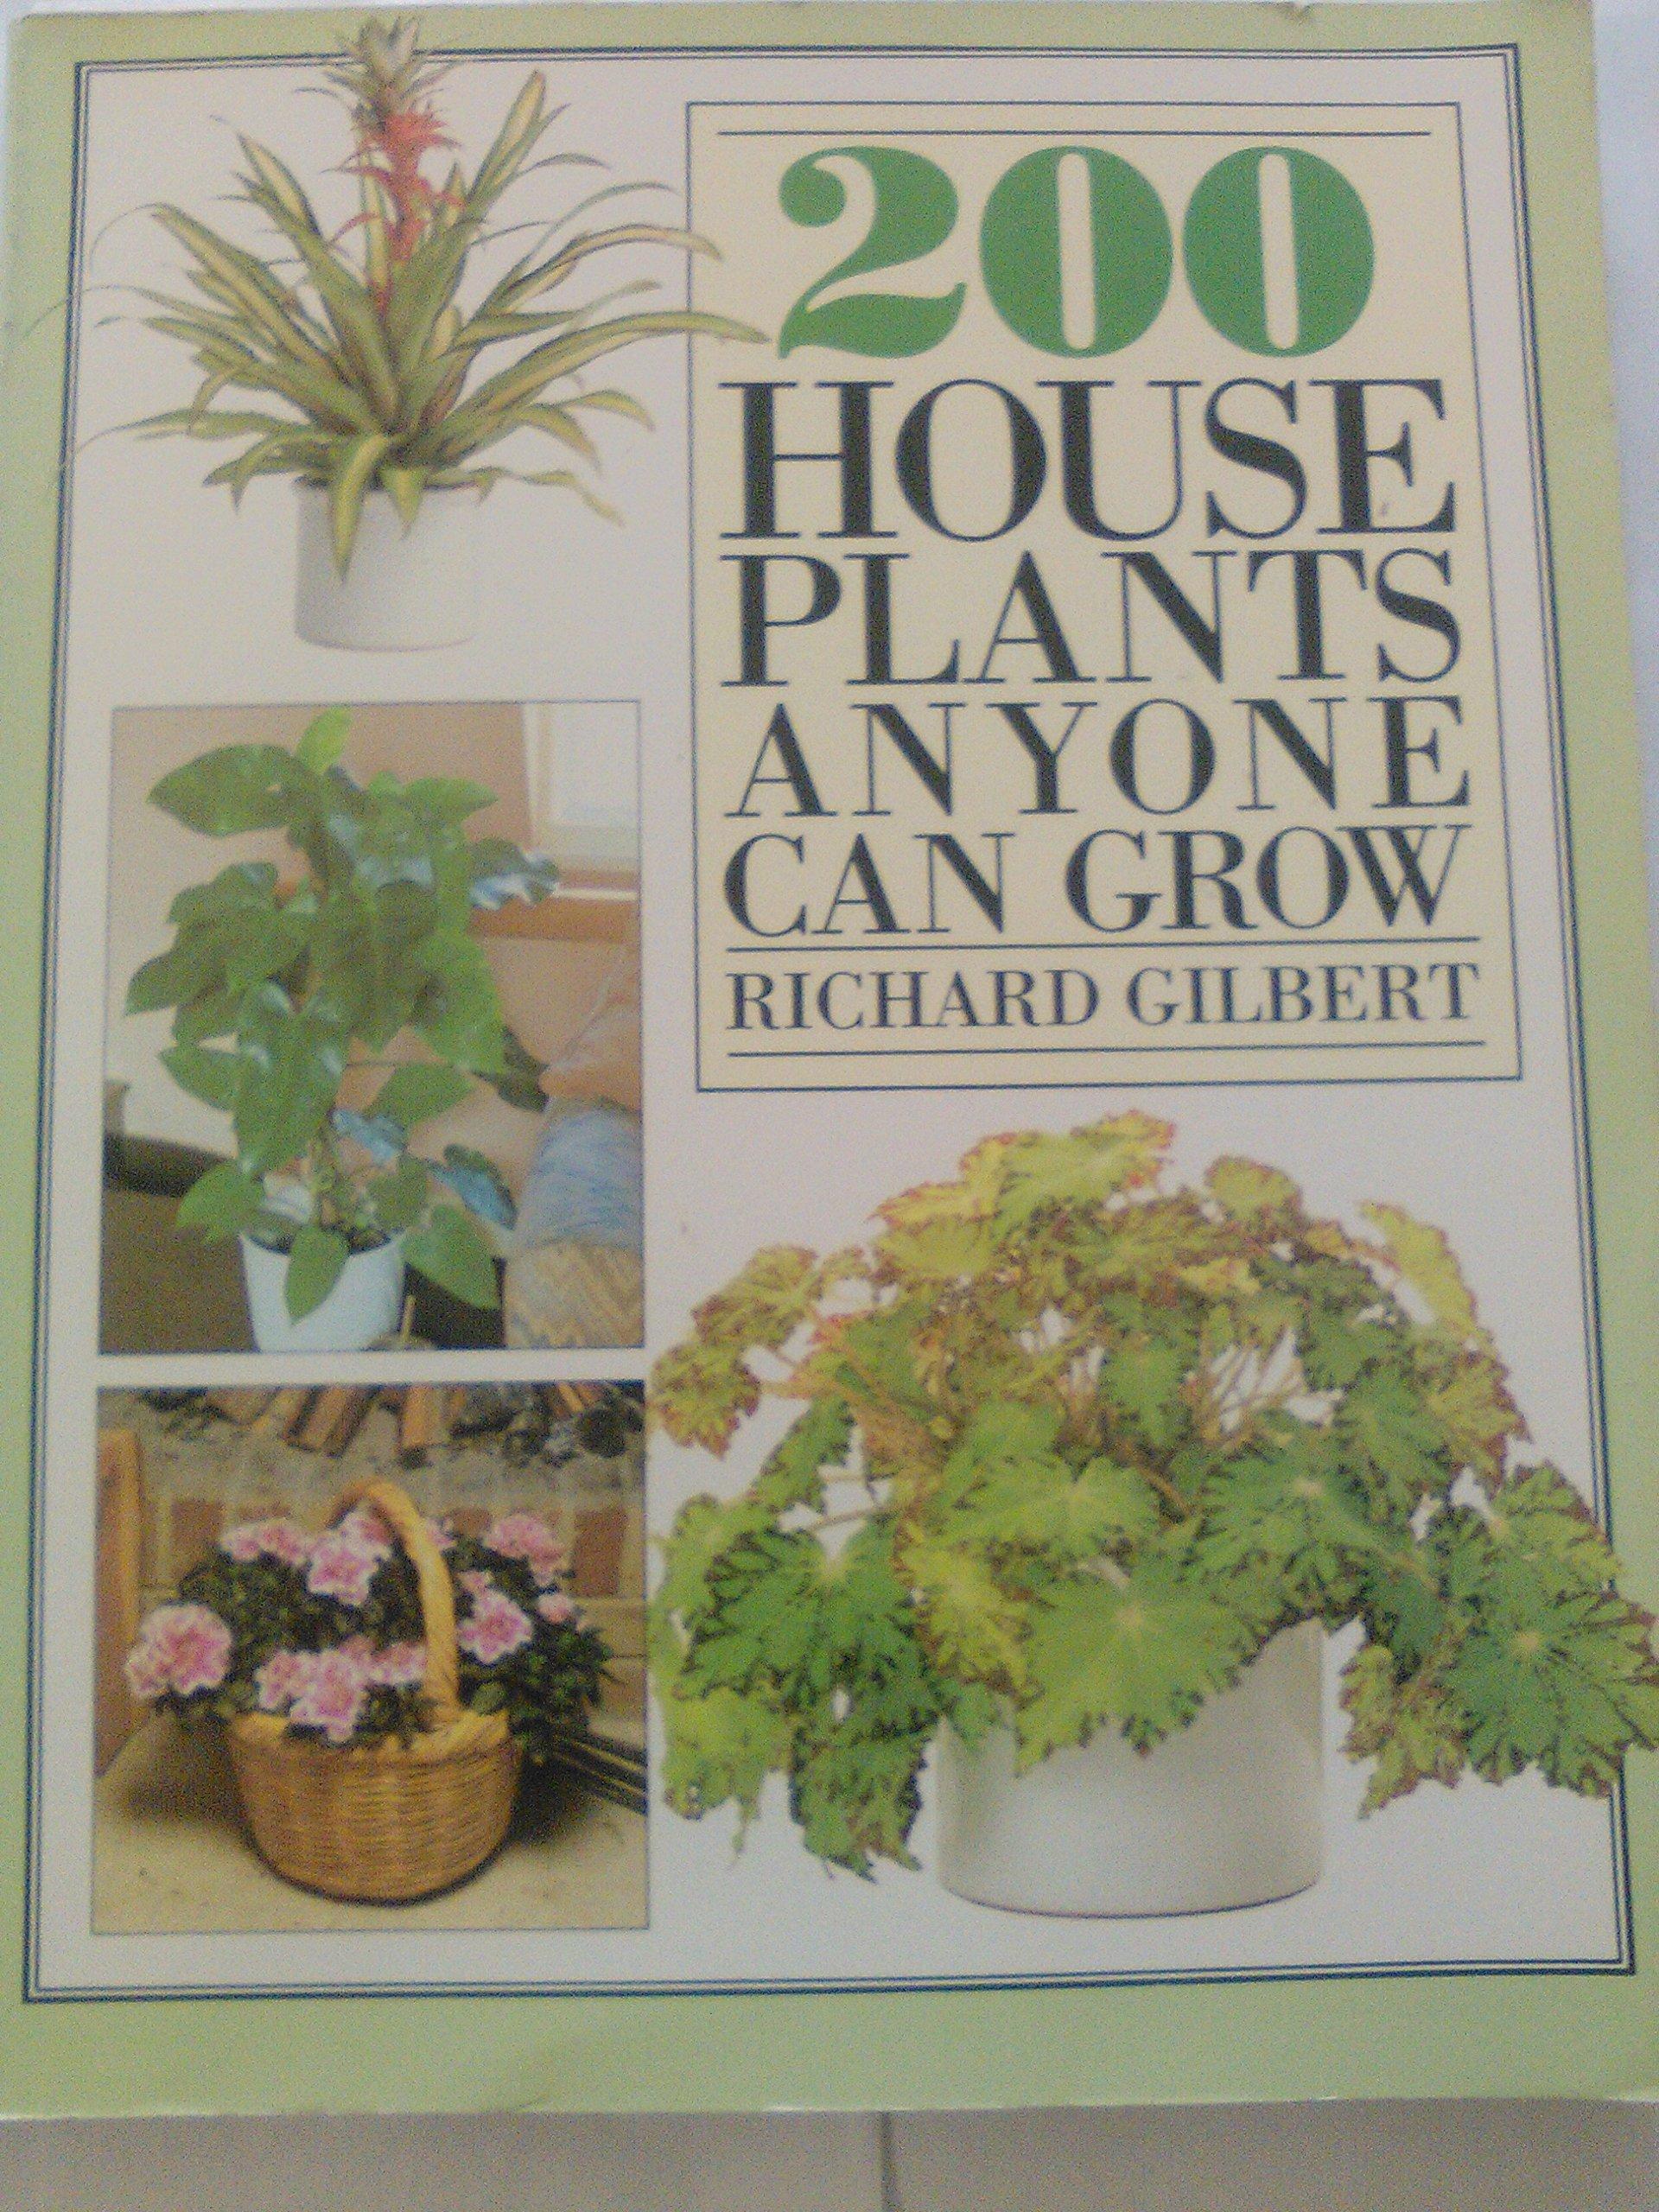 200 House Plants Anyone Can Grow